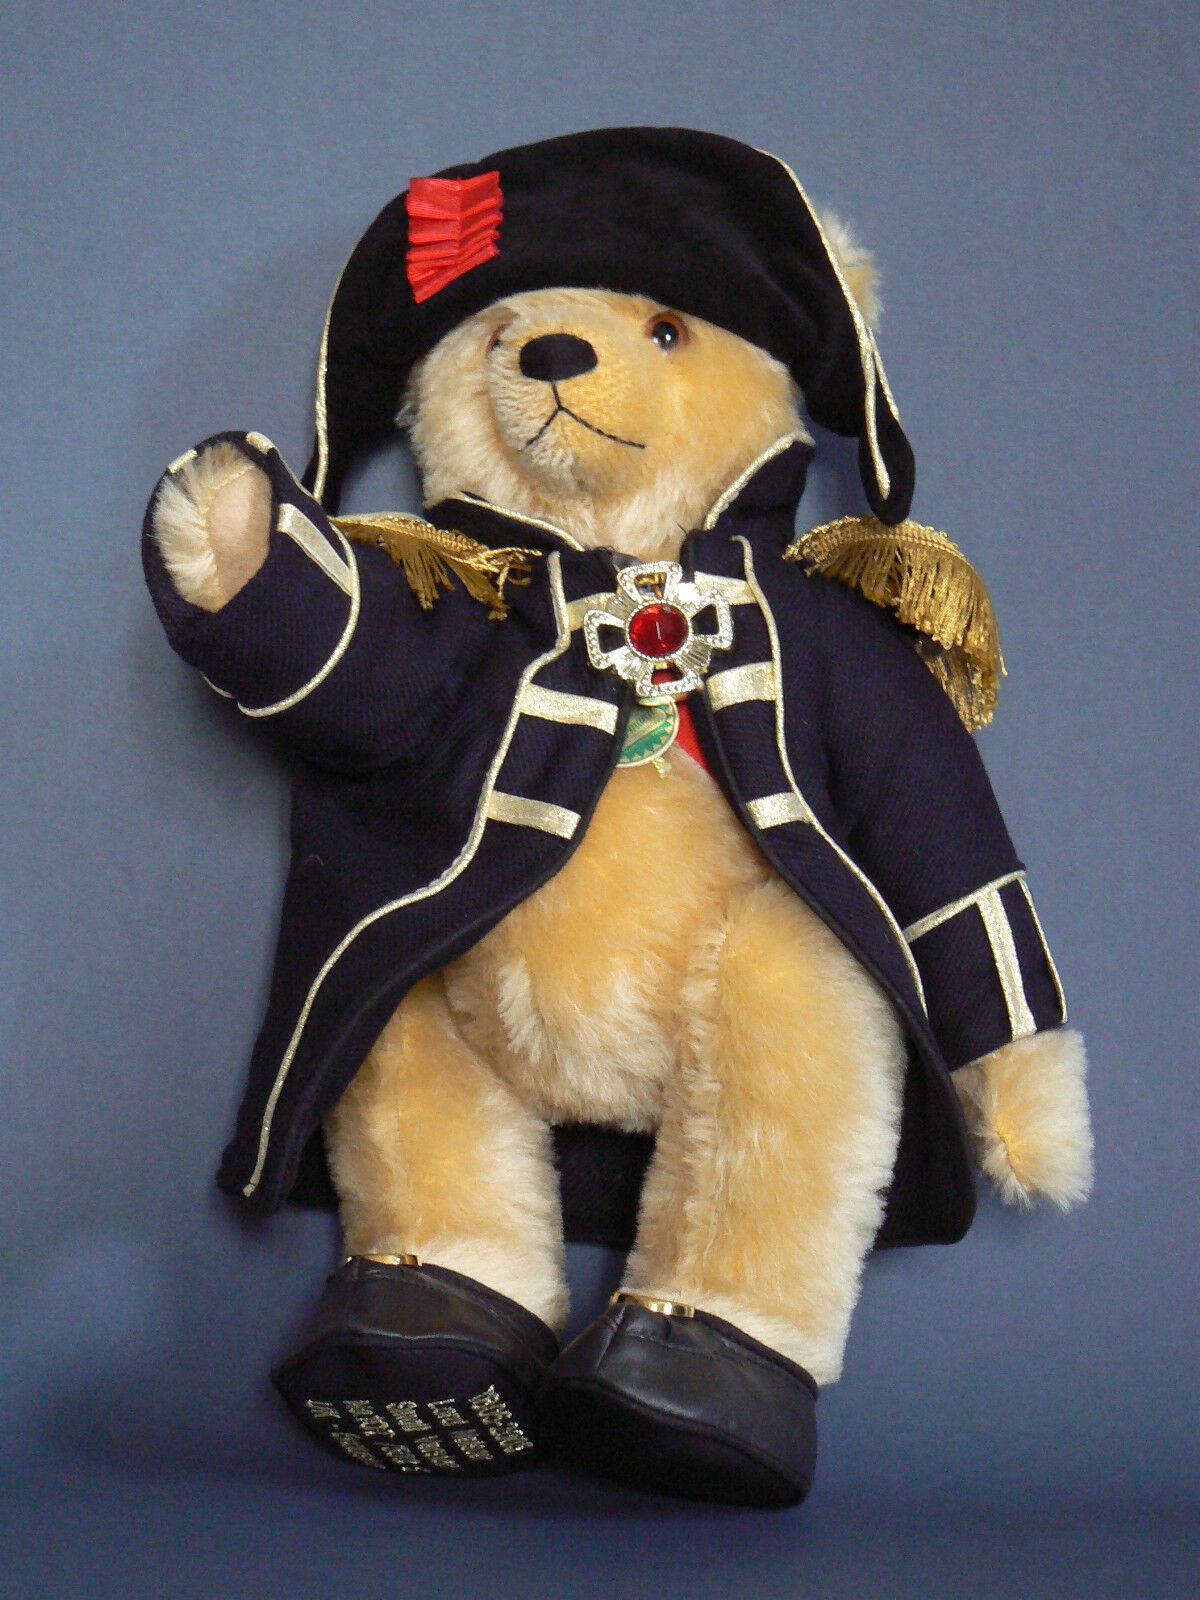 Hermann Lord Nelson Teddy 37 cm stata limitata 107/500 pezzi